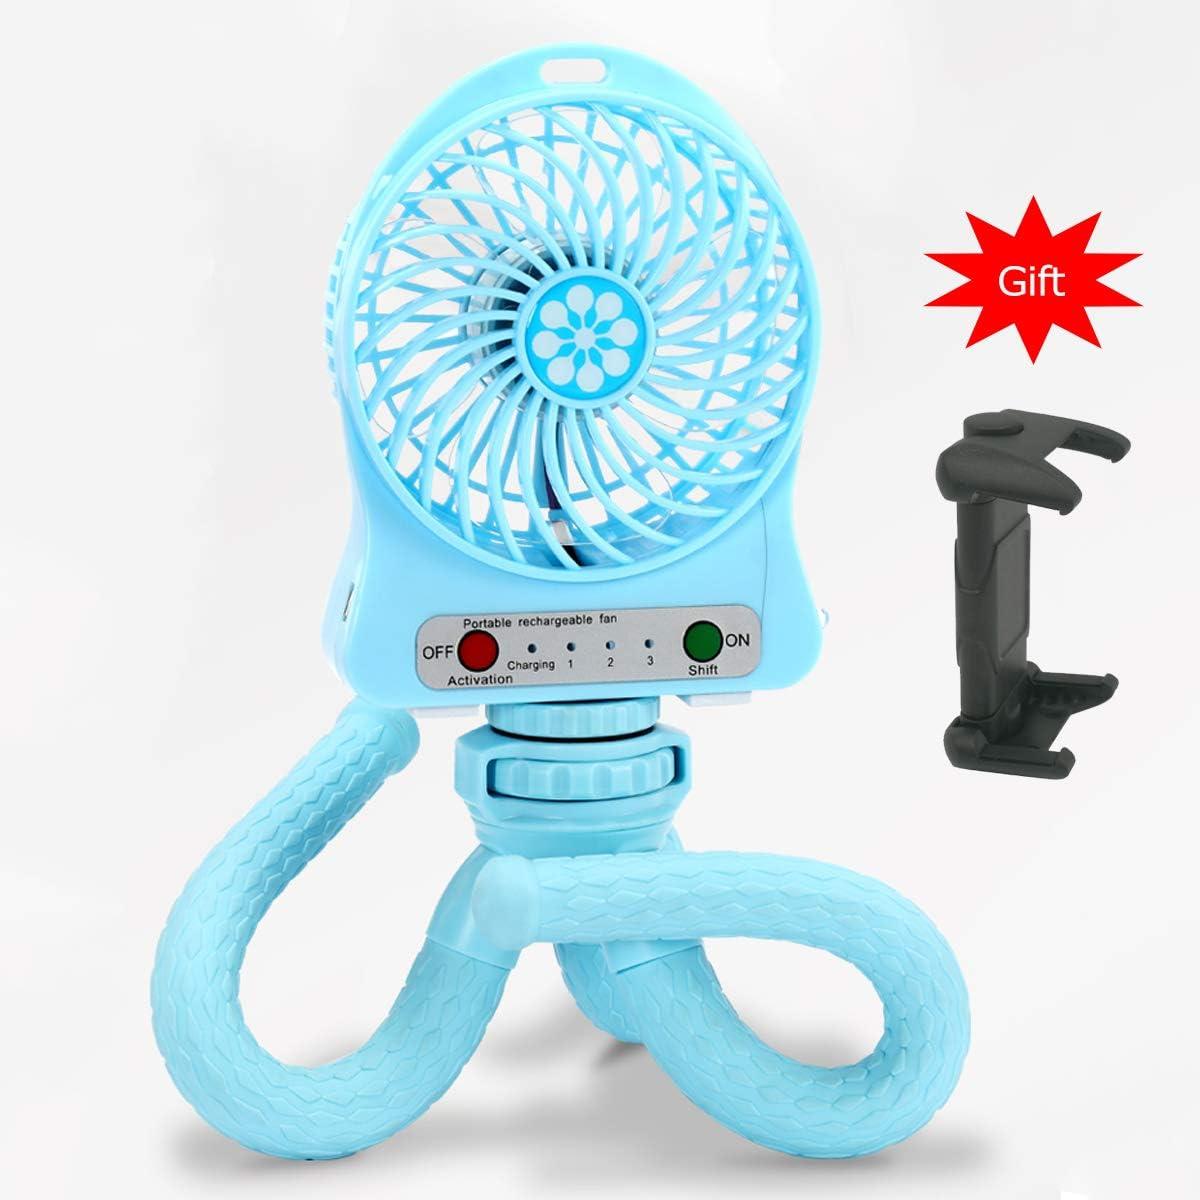 EILIKS Mini Handheld Stroller Fan, Portable Personal Baby Fan with Flexible Tripod Fix on Stroller Student Bed Bike, USB or Battery Powered Desk Fan Adjustable 3 Speeds for Camping Traveling Blue